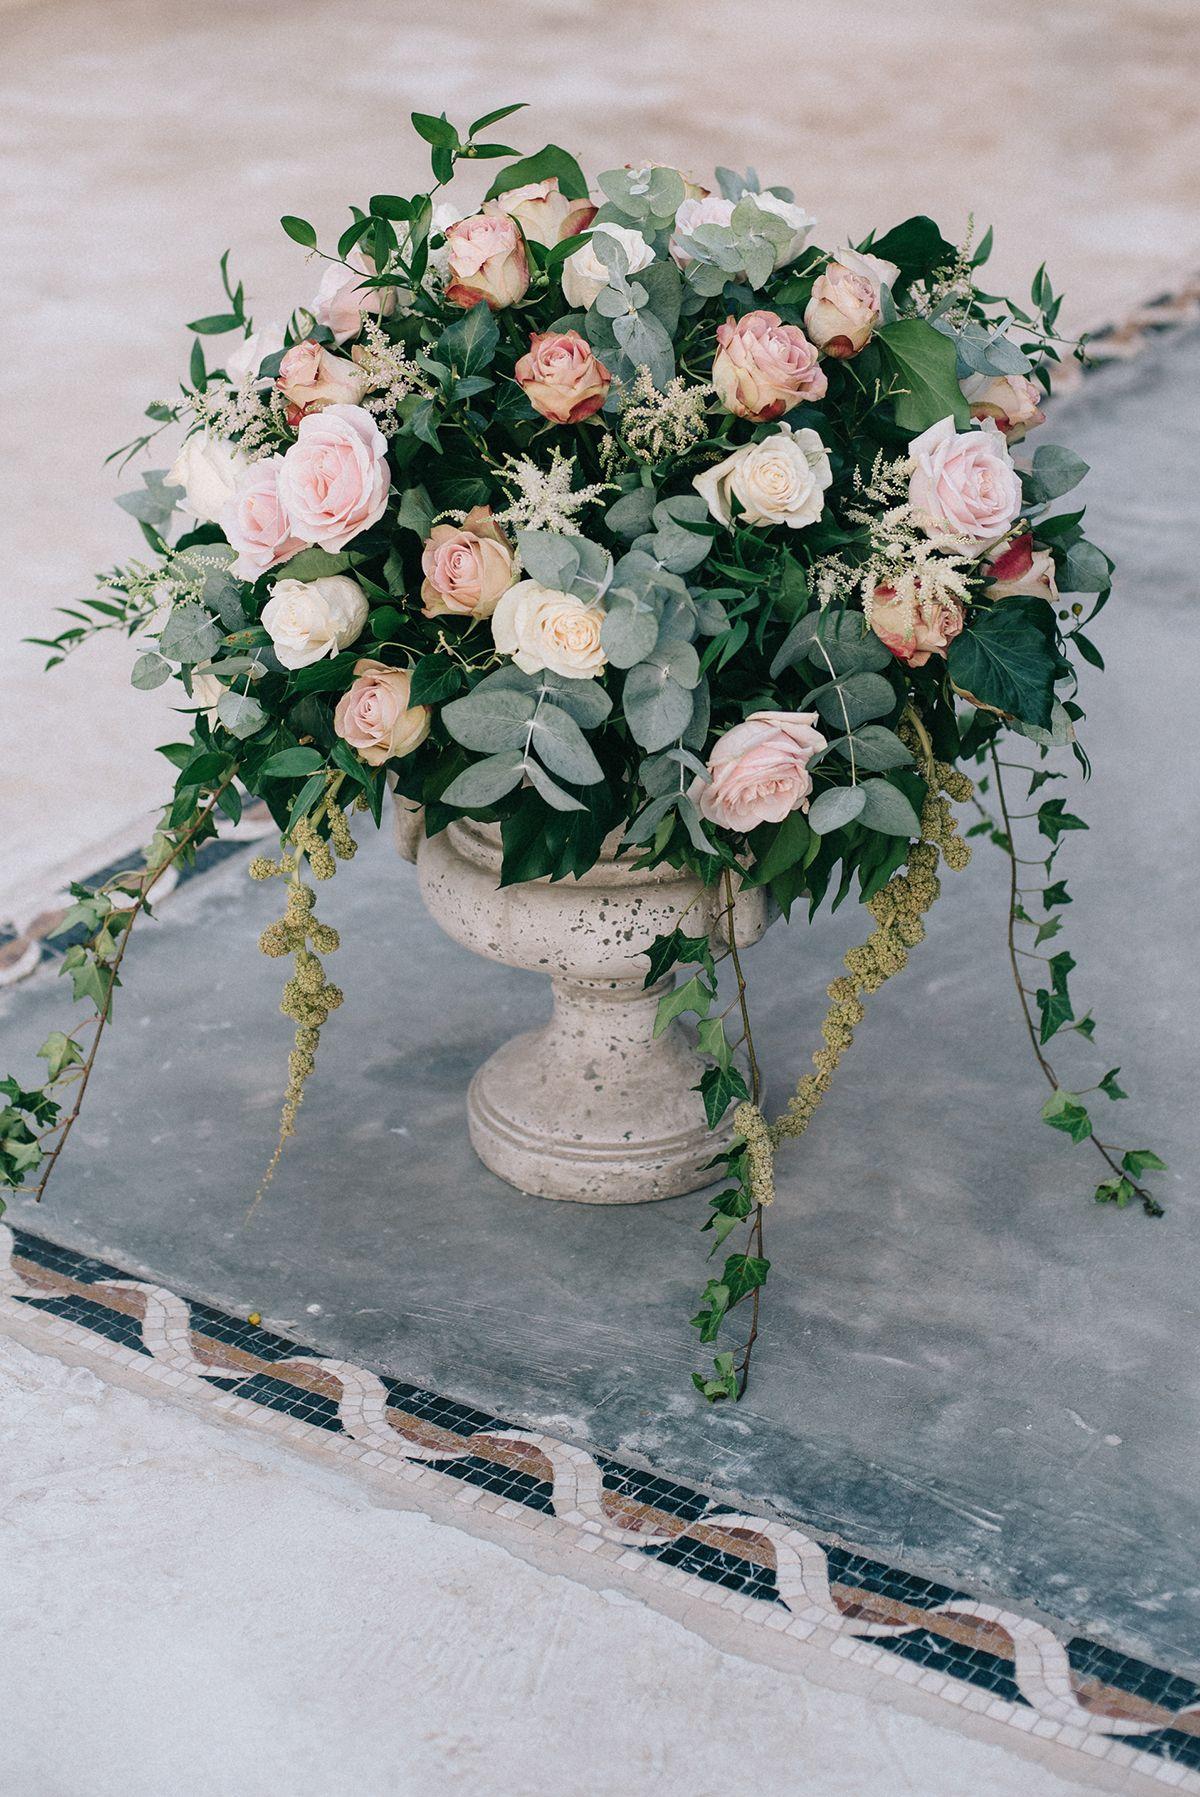 La-boda-de-MarC3ADa-JosC3A9-SuC3A1rez-y-Jordi-Nieto-86.jpg